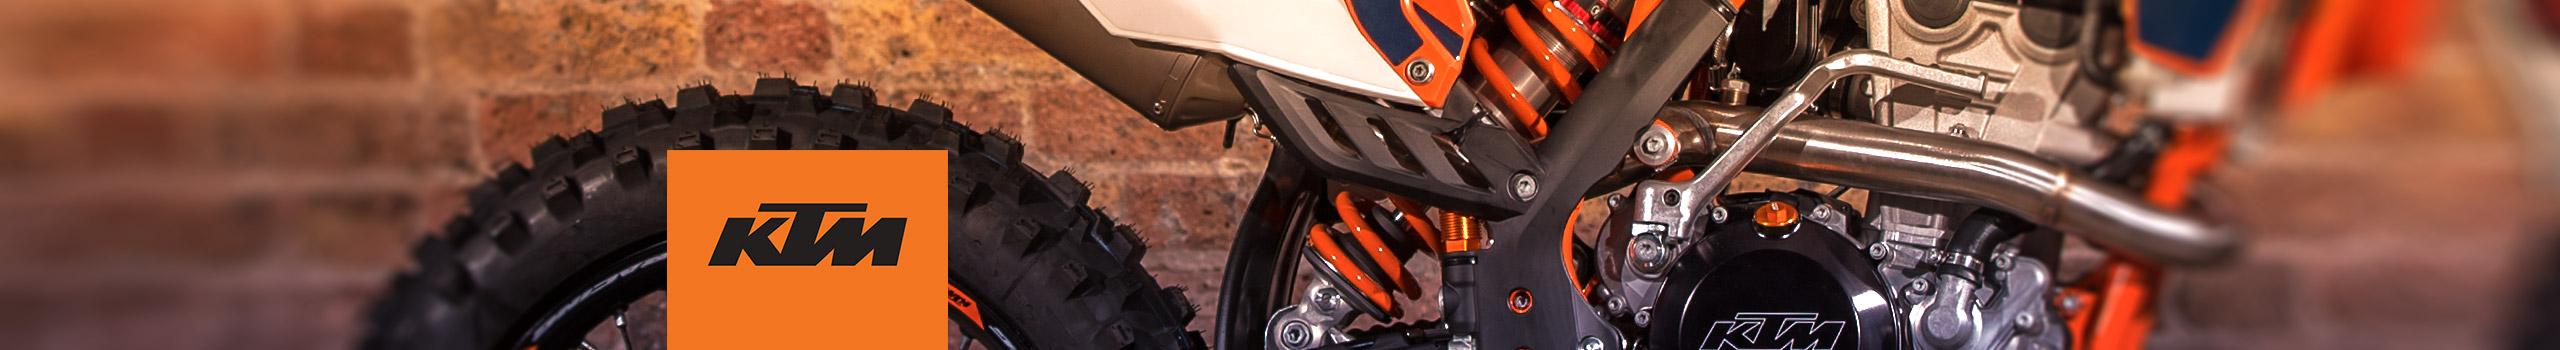 KTM Superduke motorcycles for sale on Auto Trader Bikes